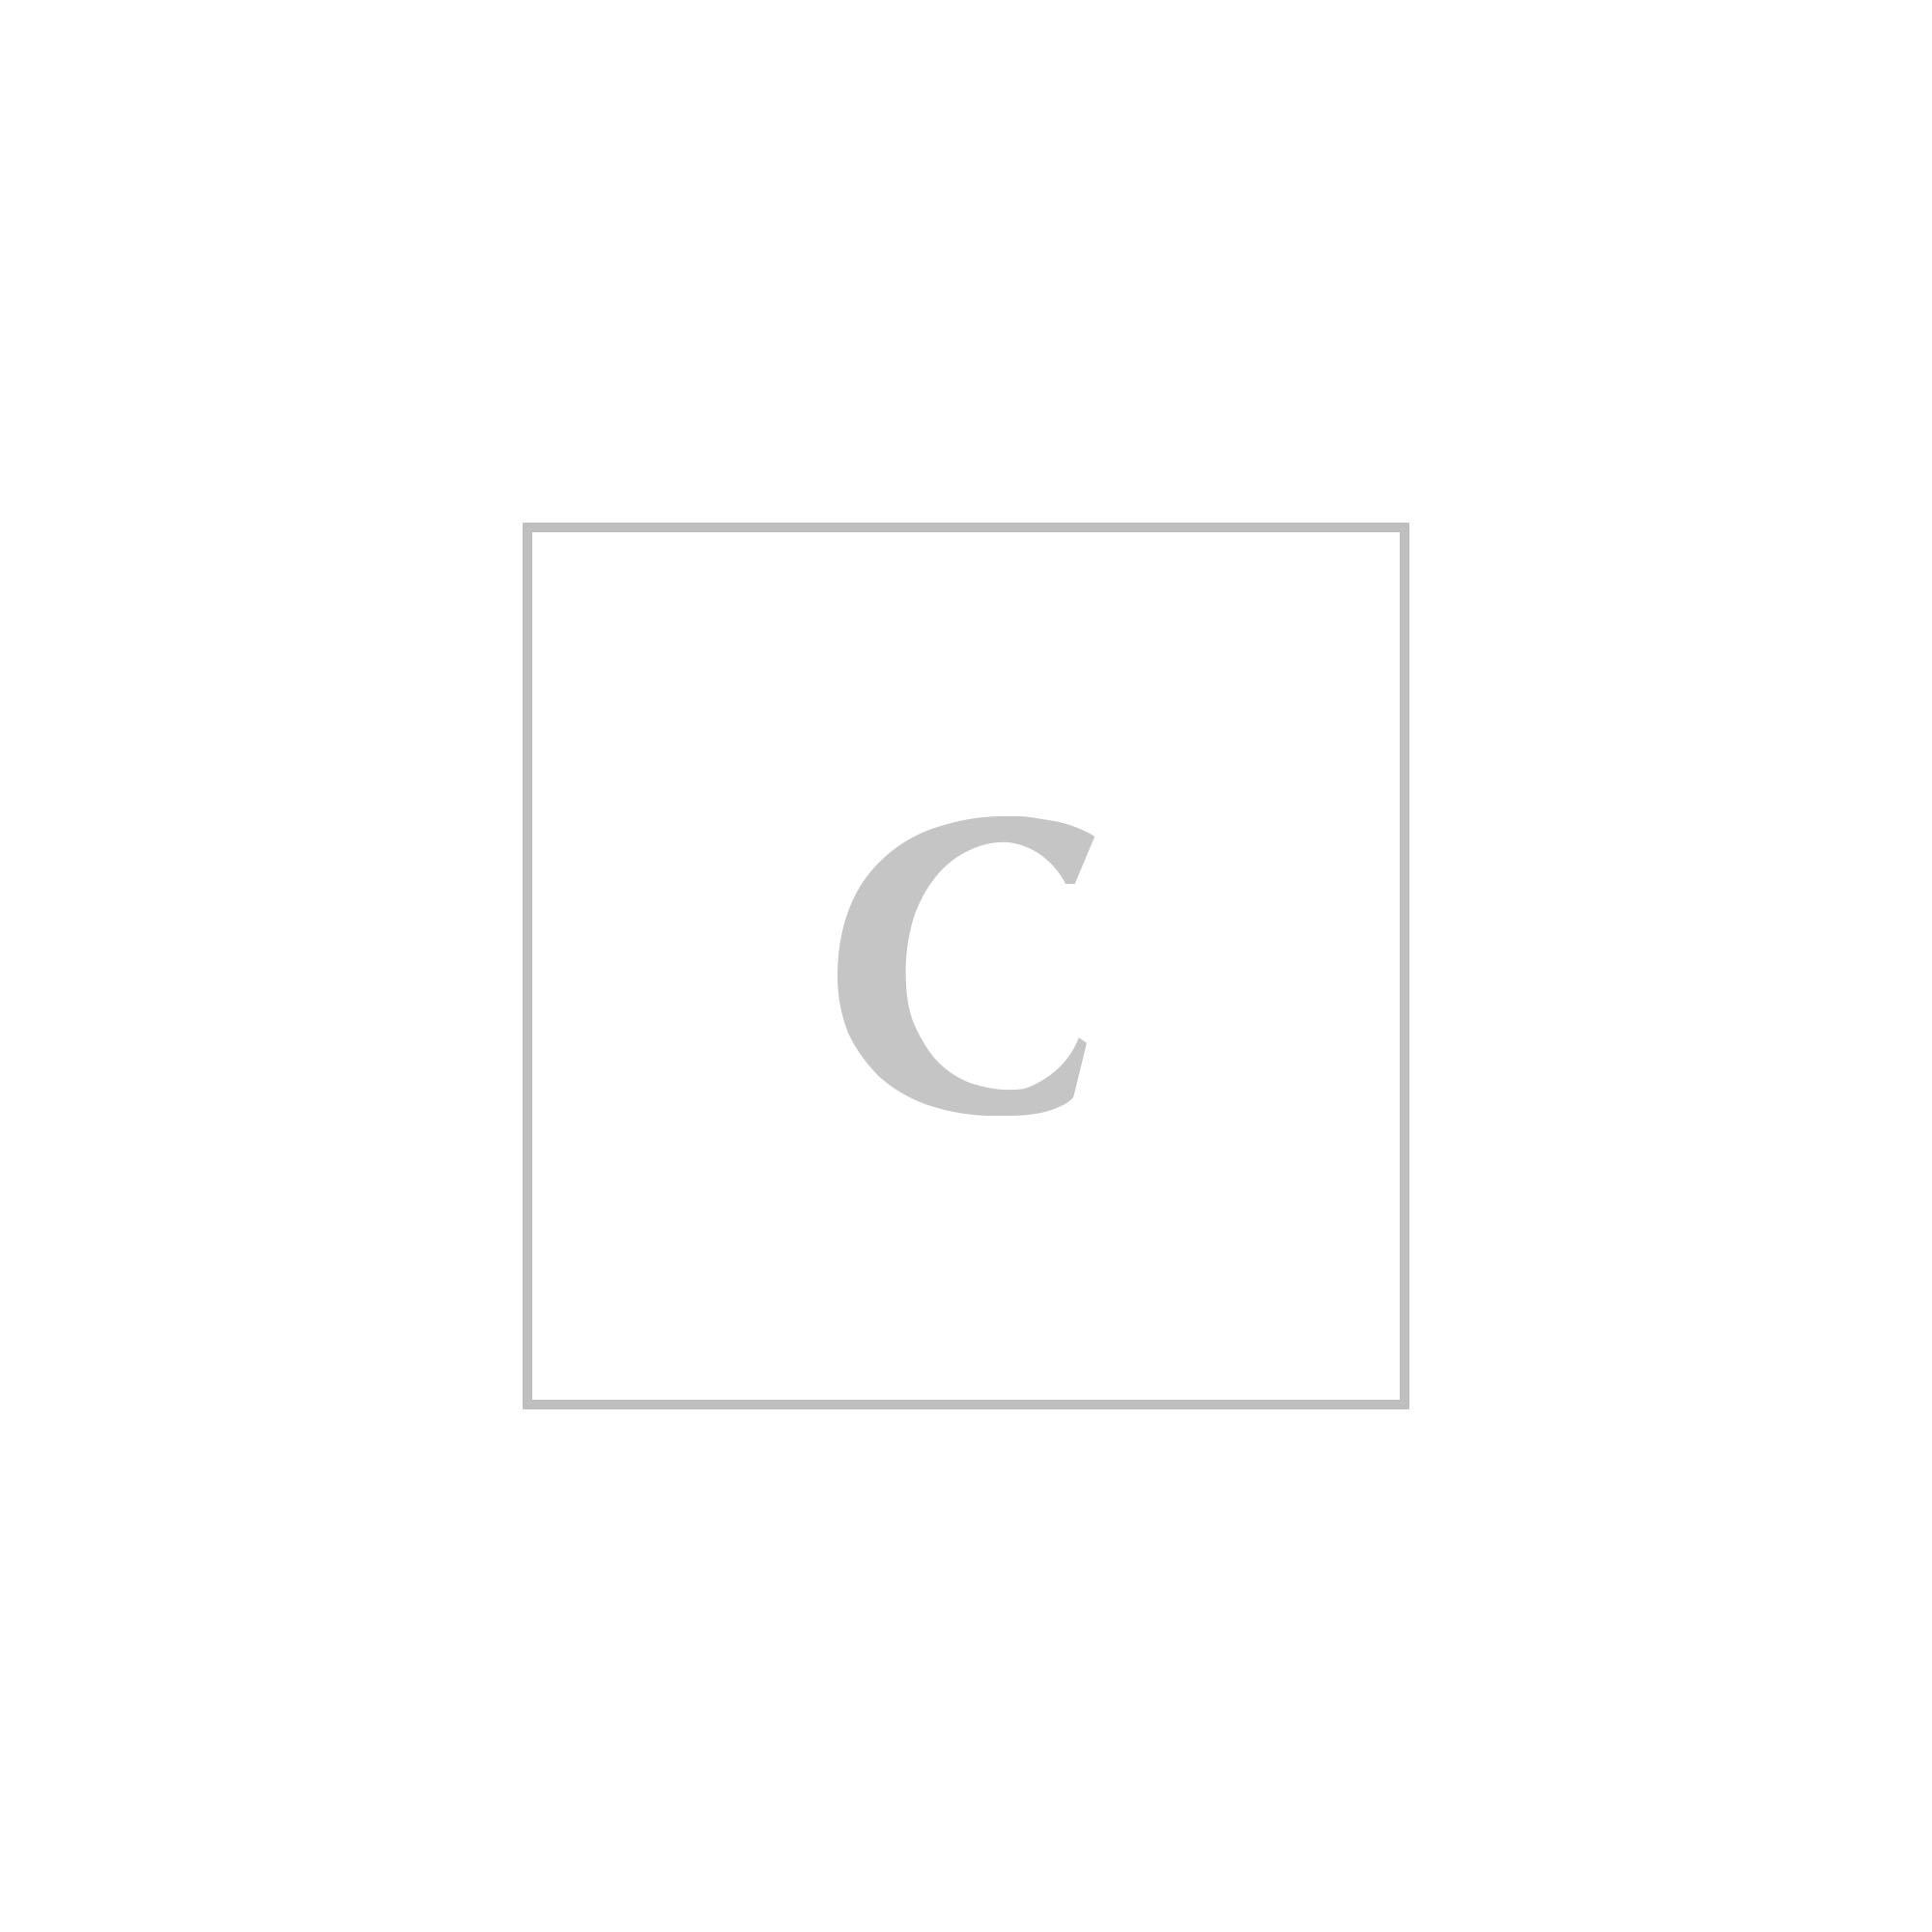 Salvatore ferragamo piccola pelletteria varia nadir 660010 002 mvit doiha sp.1-1